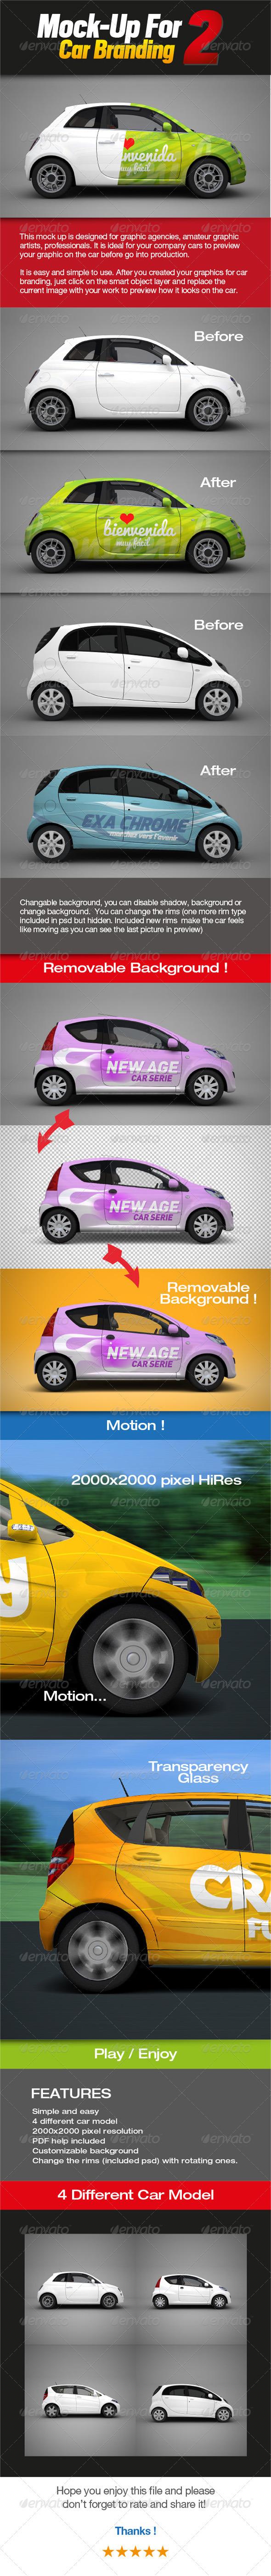 GraphicRiver Mock-up for Car Branding 2 2561612